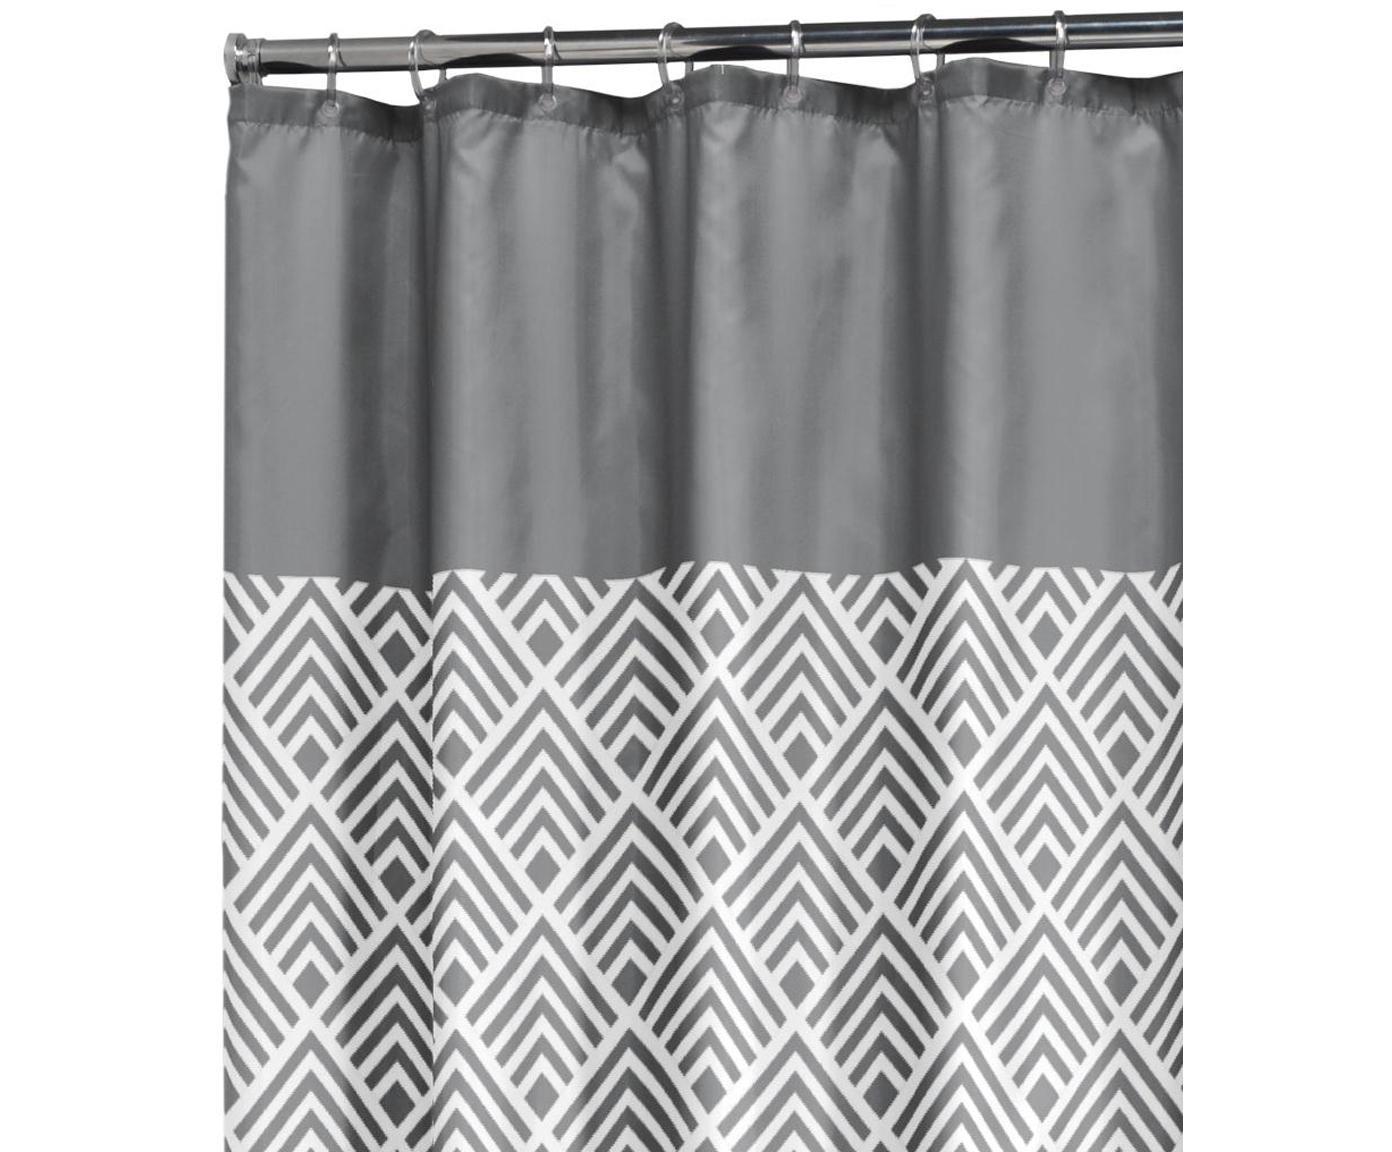 Tenda da doccia a motivi geometrici Allie, Grigio, bianco, Larg. 180 x Lung. 200 cm